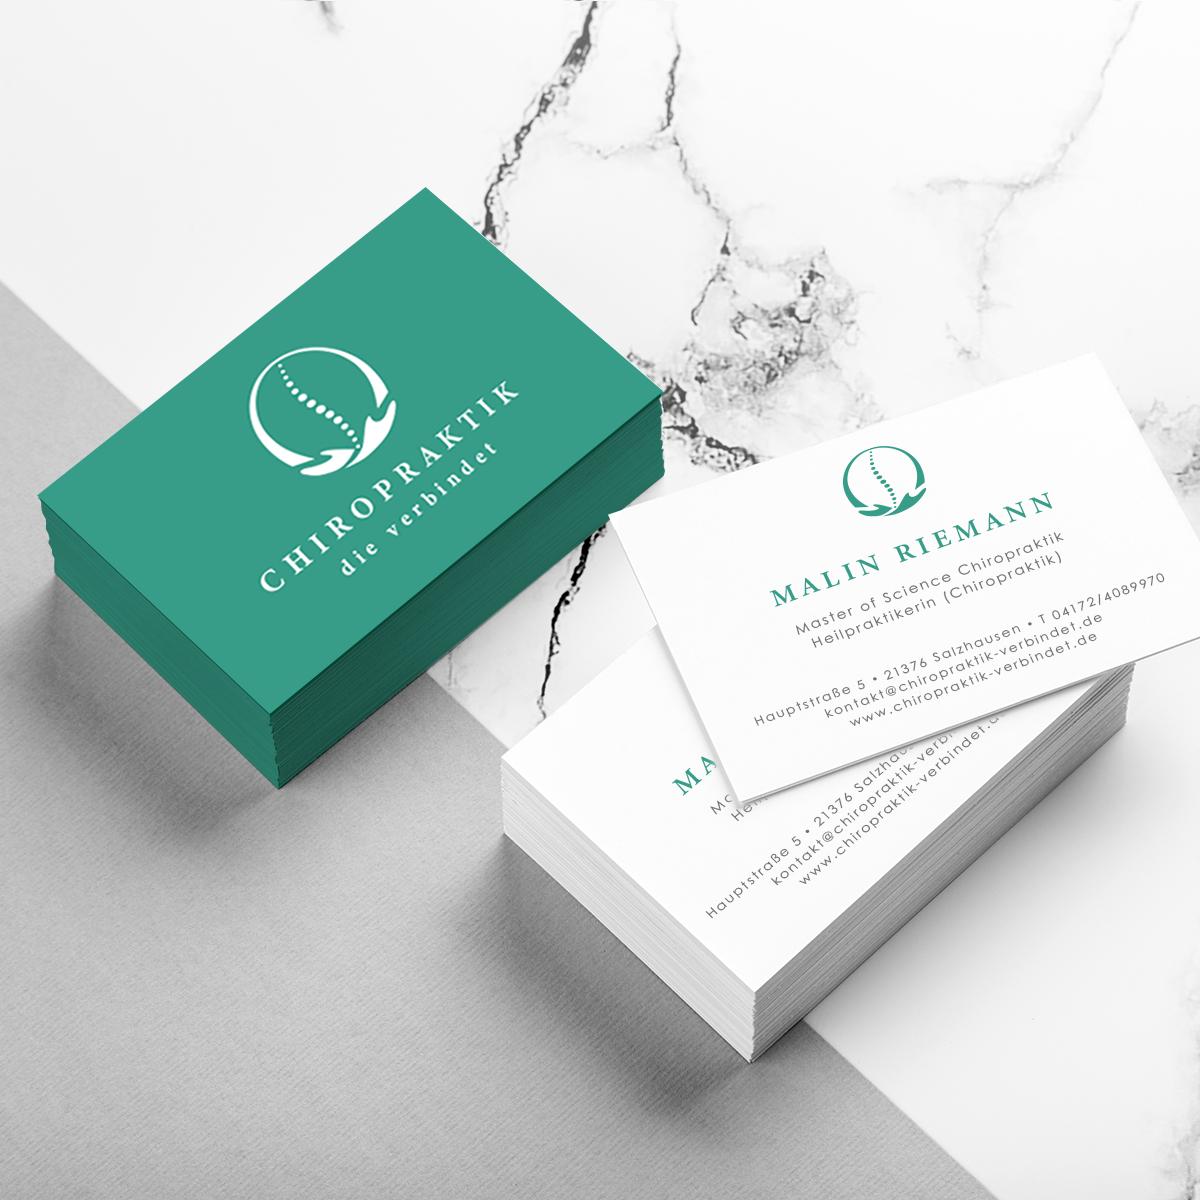 Bob Agency - Werbeagentur für Corporate Design - business cards - Malin Riemann